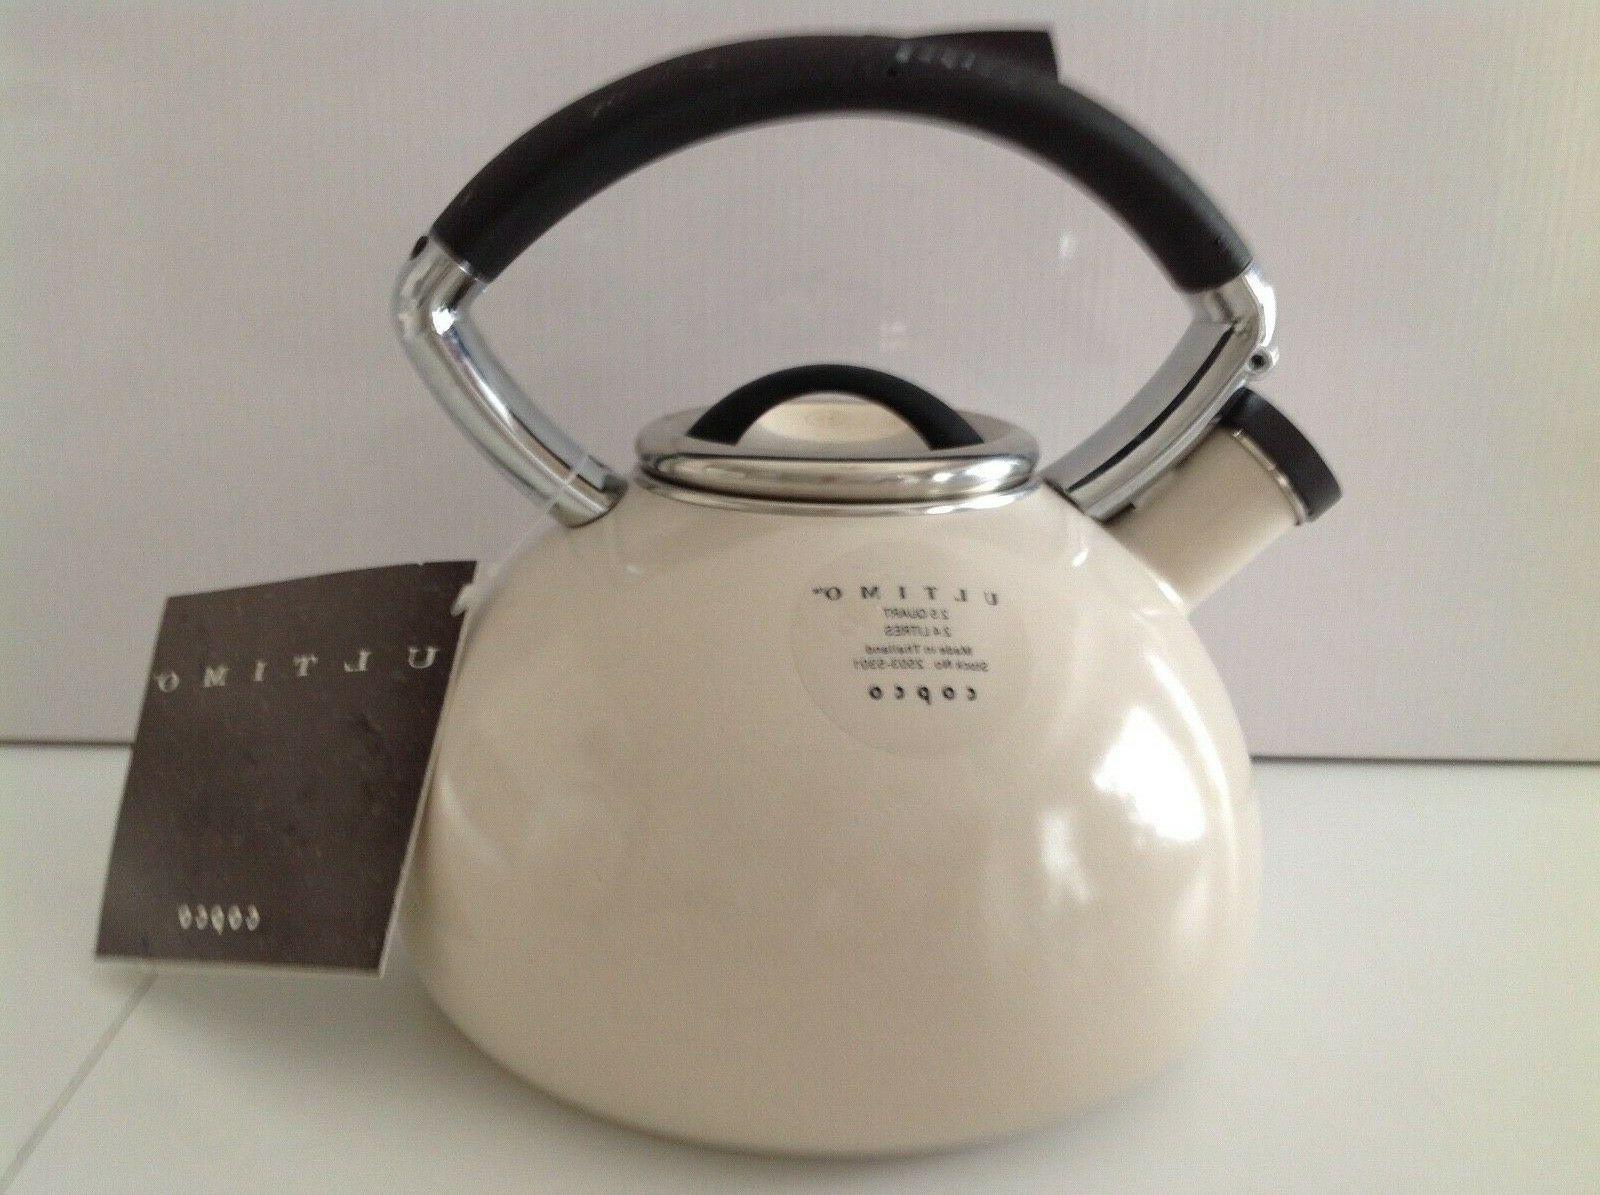 enamel on steel whistling tea kettle 2